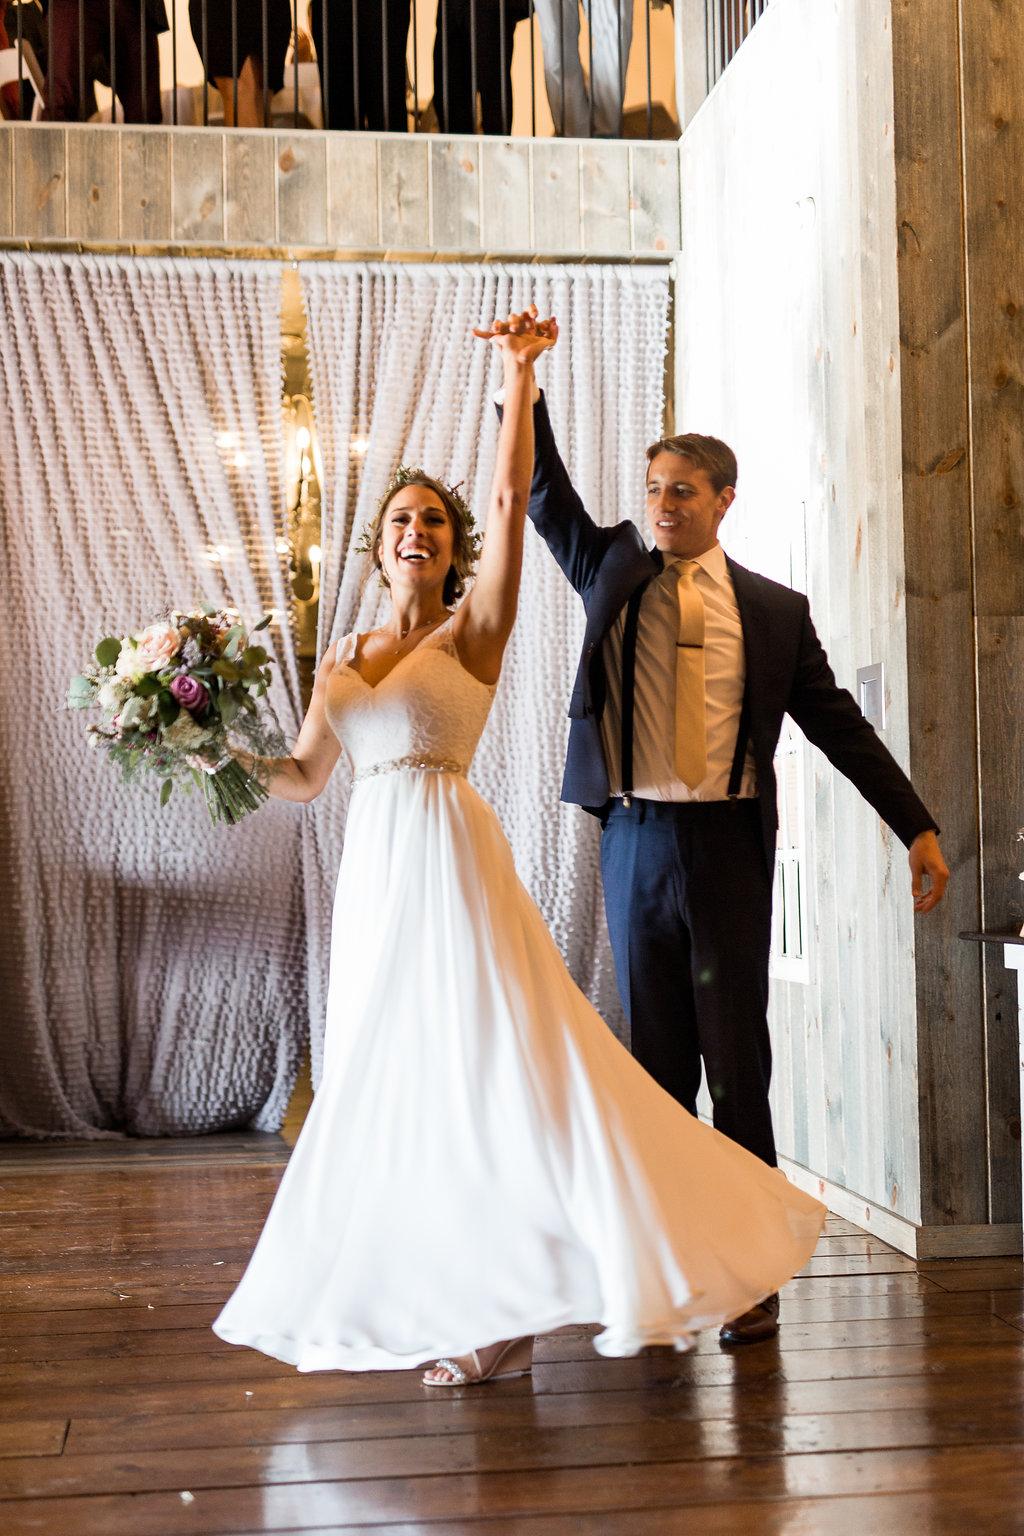 Sonshine_barn_northern_michigan_wedding_-85.jpg